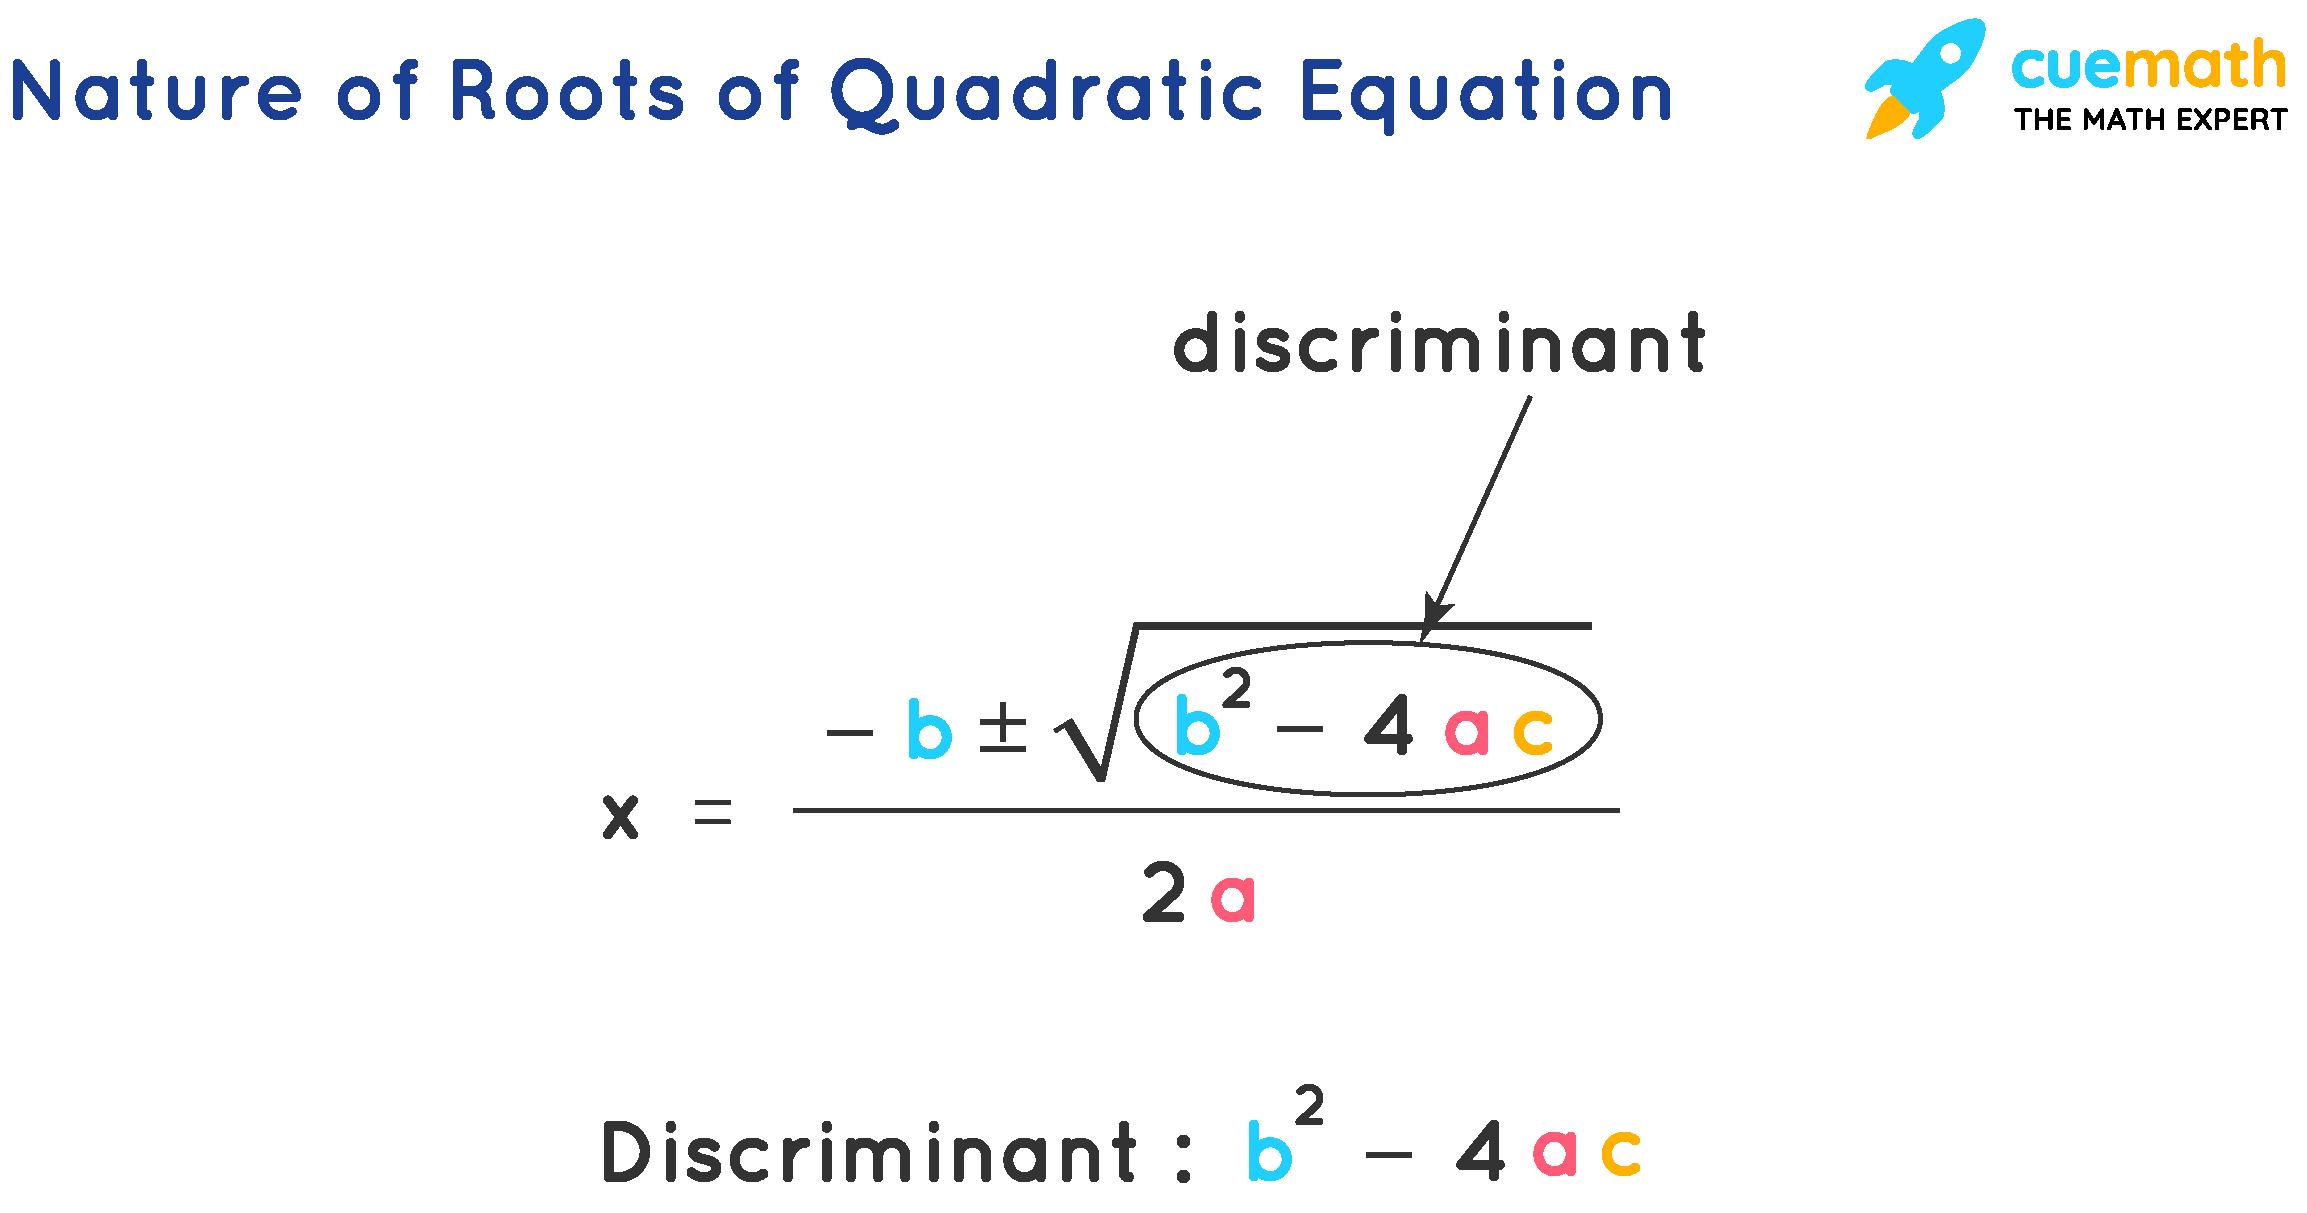 Nature of Roots of a Quadratic Equation